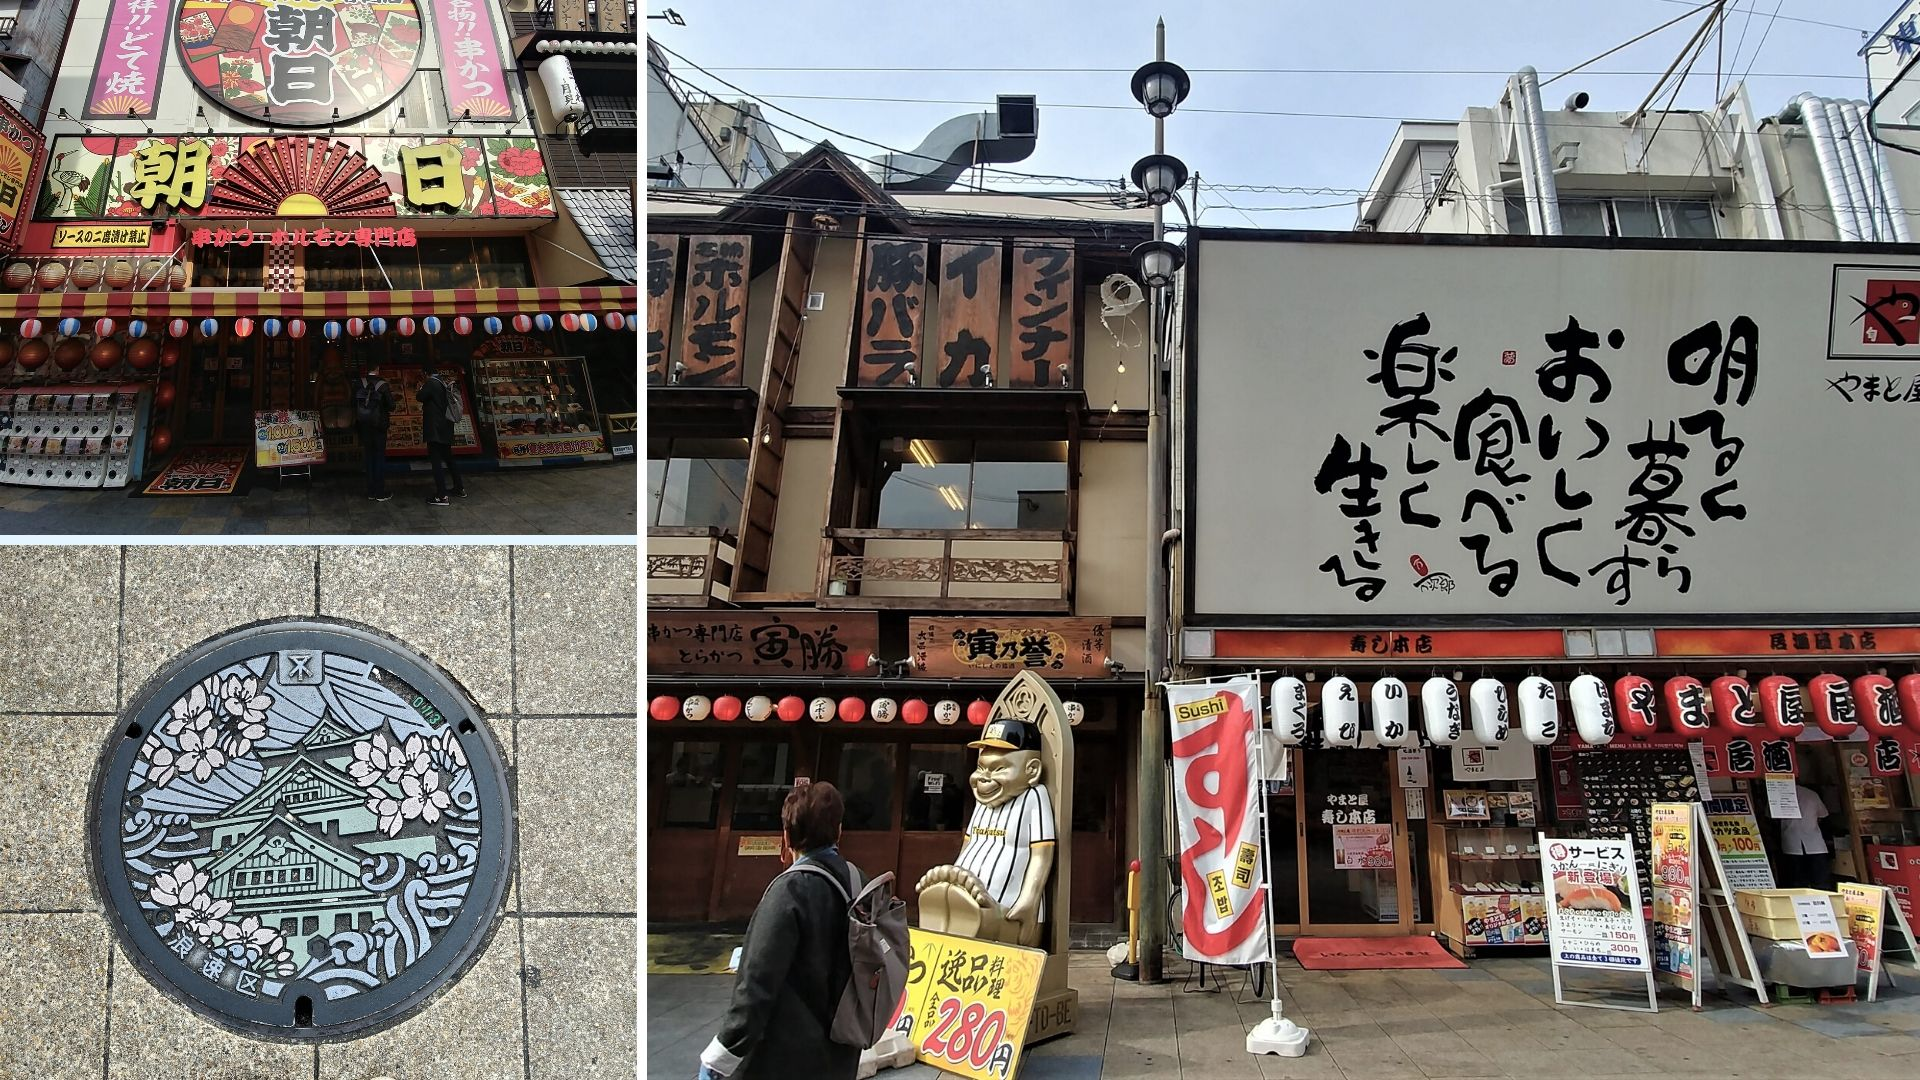 Osaka visiter Shinsekai Tennoji blog voyage japon arpenter le chemin